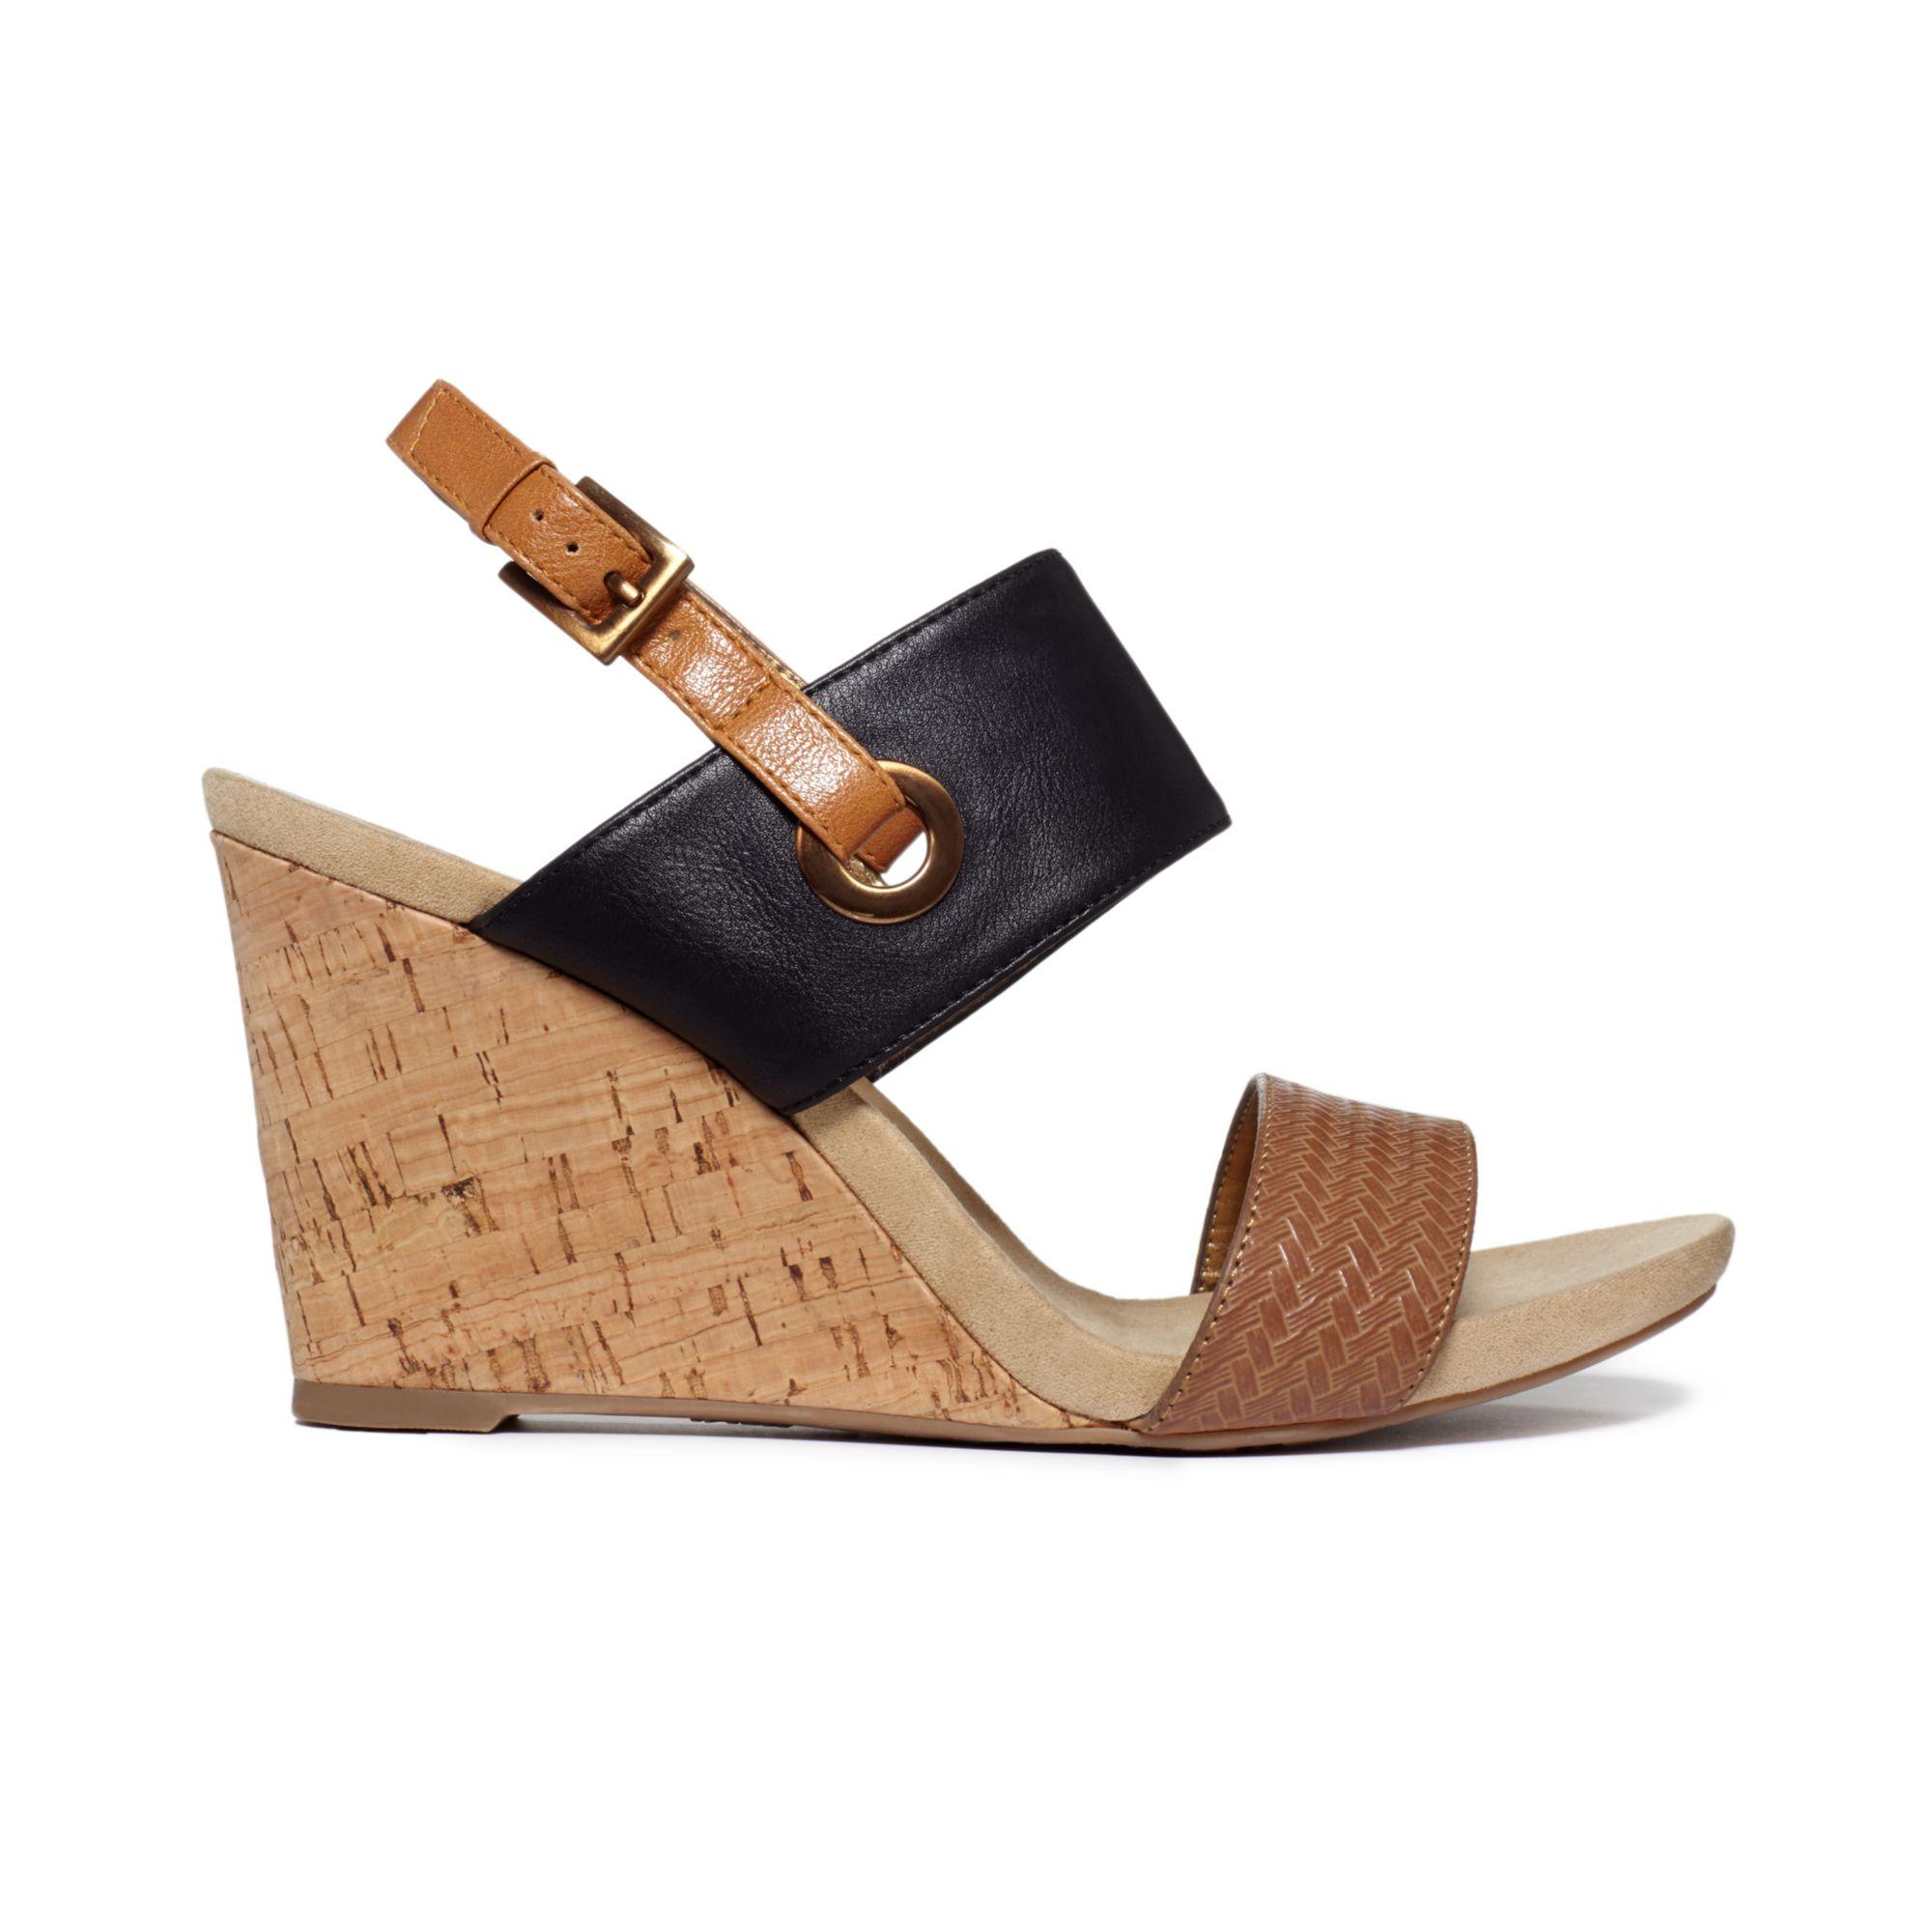 Anne Klein Taye Double Cross Strap Wedge Sandals In